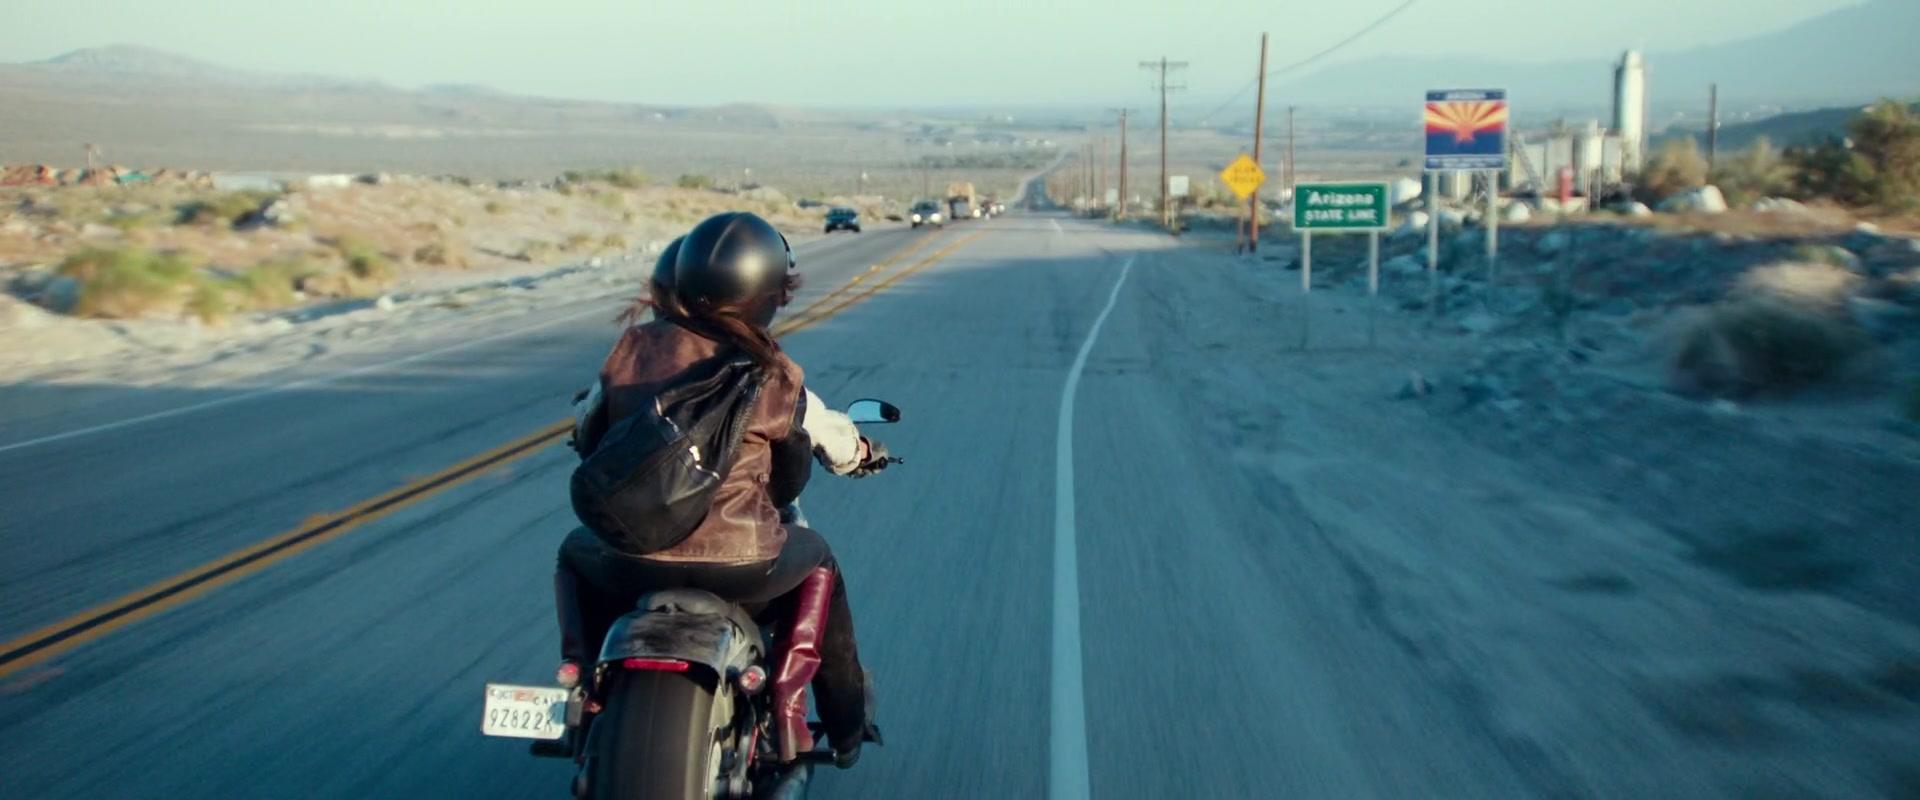 Harley Davidson Movie: Harley-Davidson CVO Pro Street Breakout Motorcycle Used By